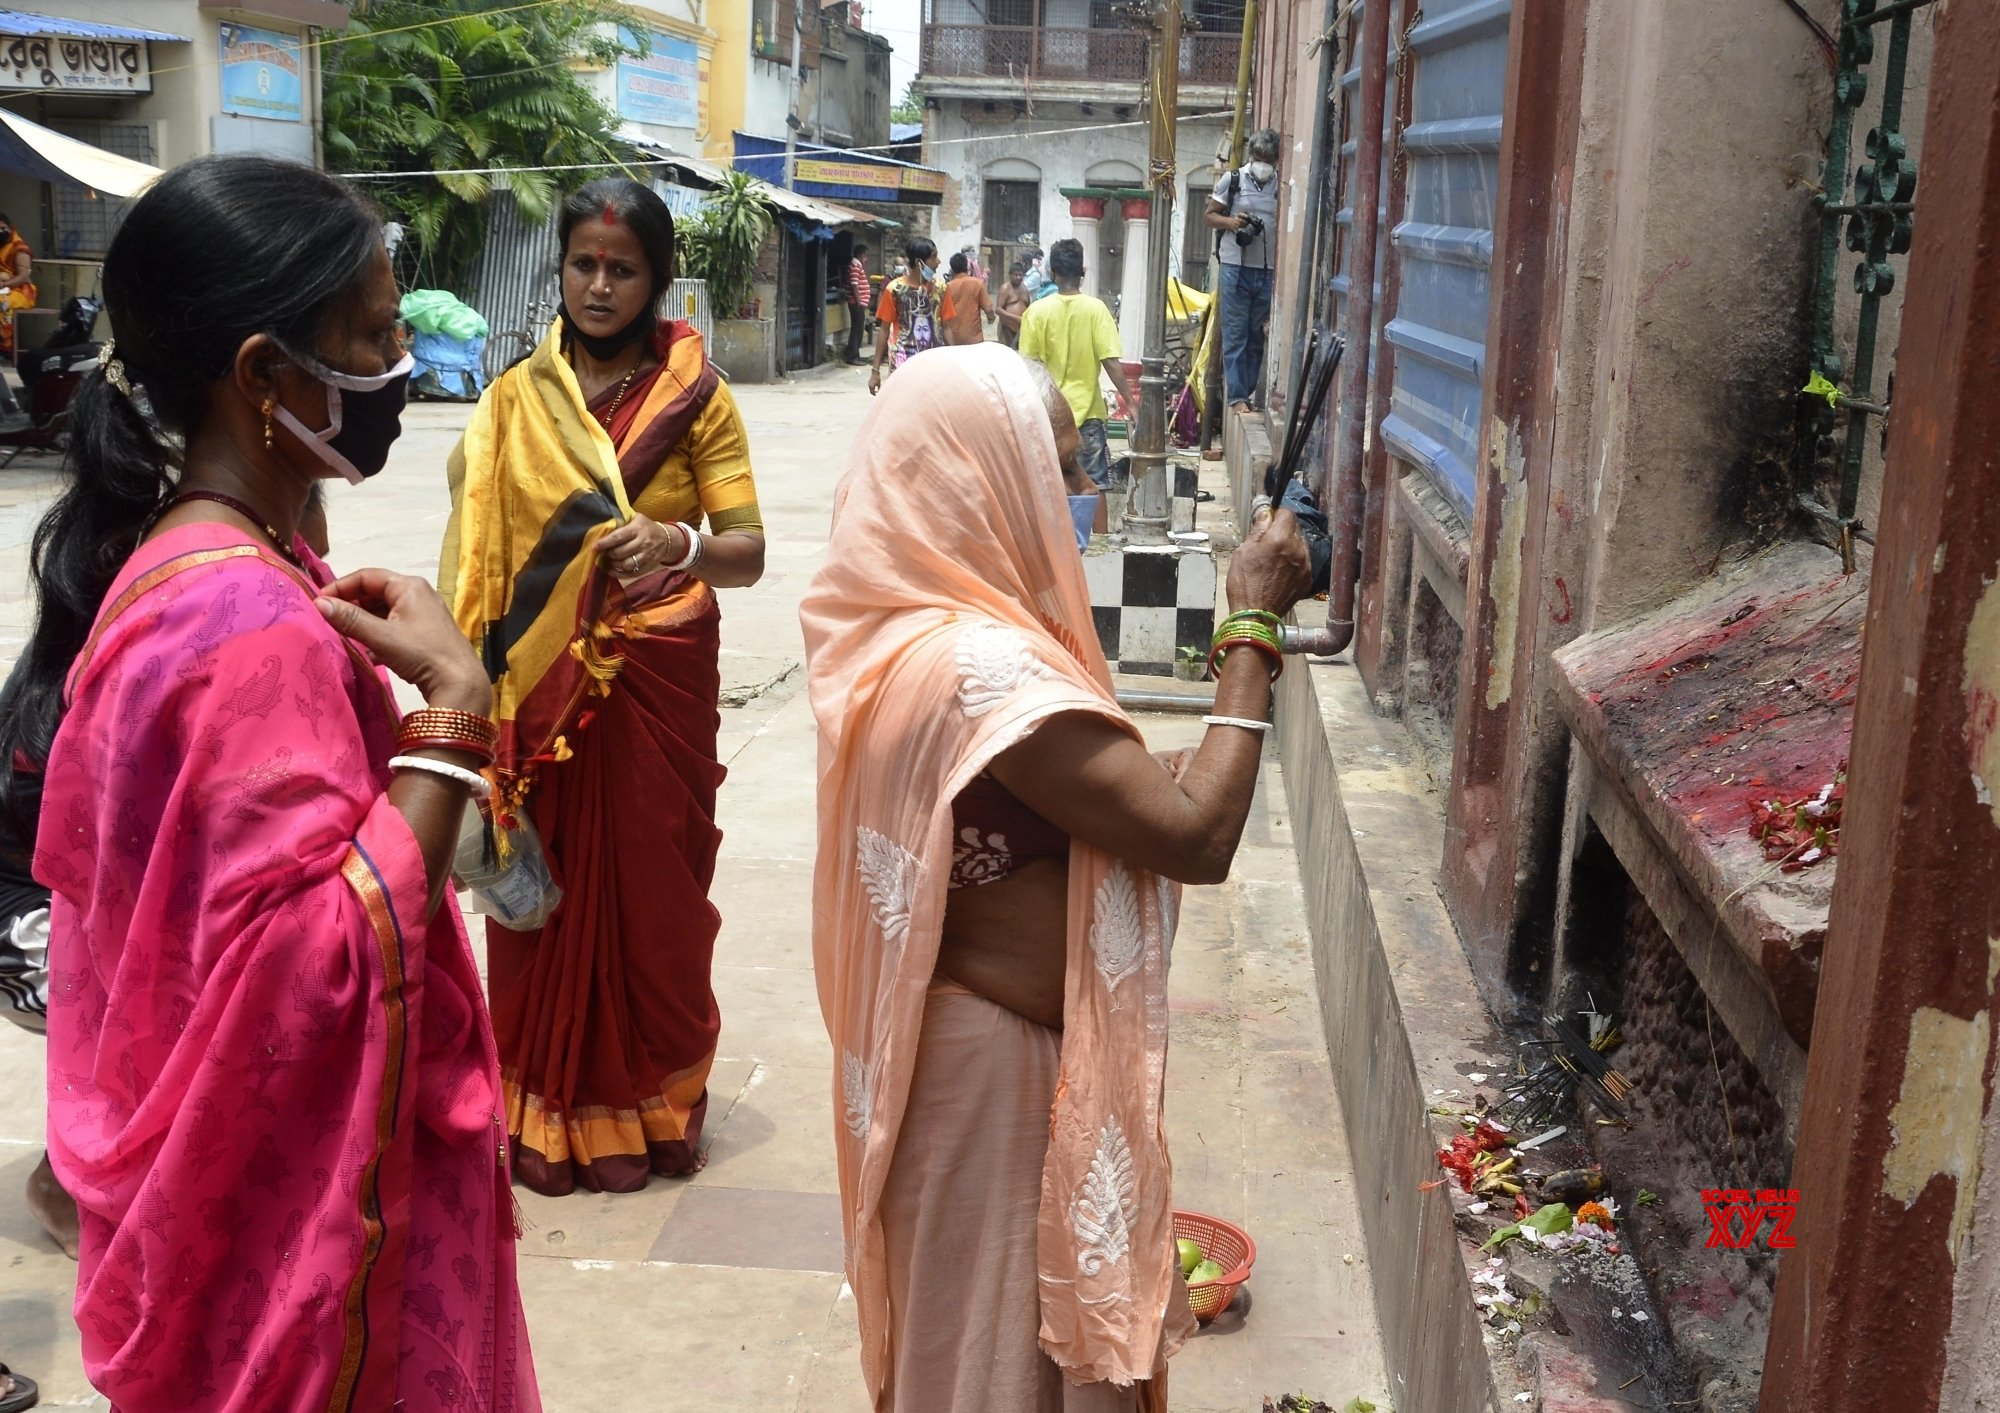 Kolkata: Devotees perform Bipodtarini puja at the Kalighat Kali temple #Gallery